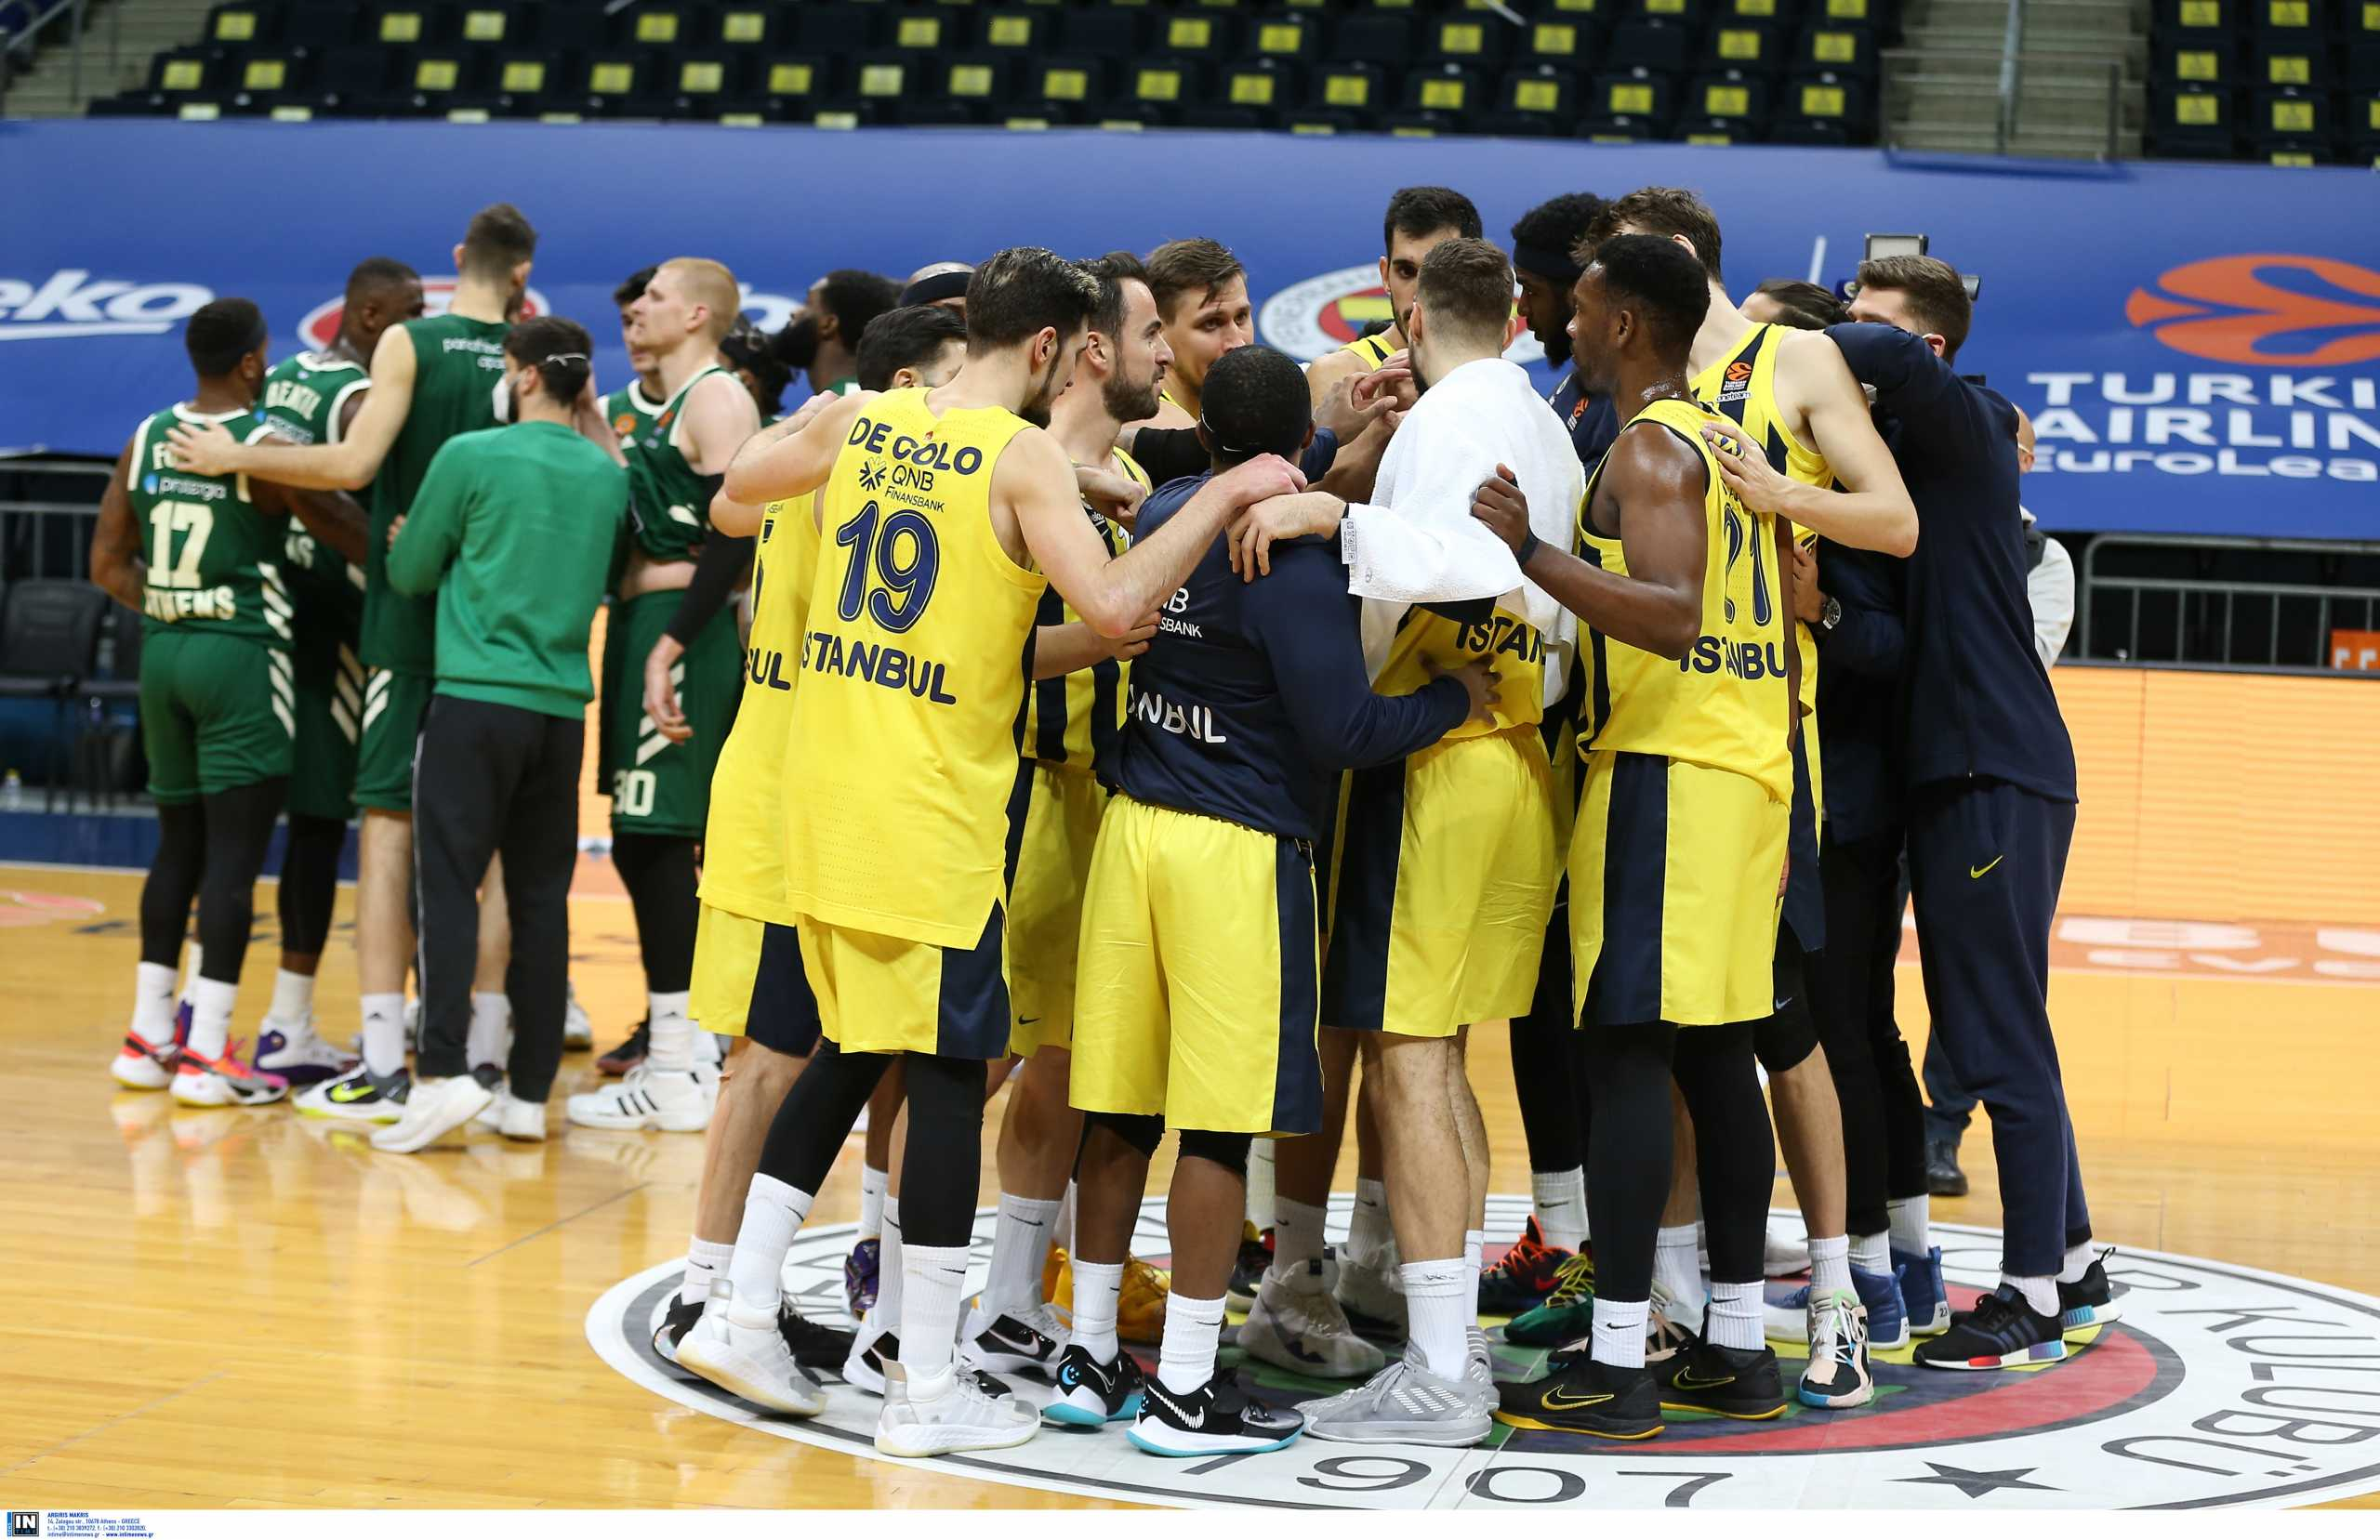 Euroleague: «Σκούπα» στη Φενέρμπαχτσε με πέντε παίκτες στην έξοδο